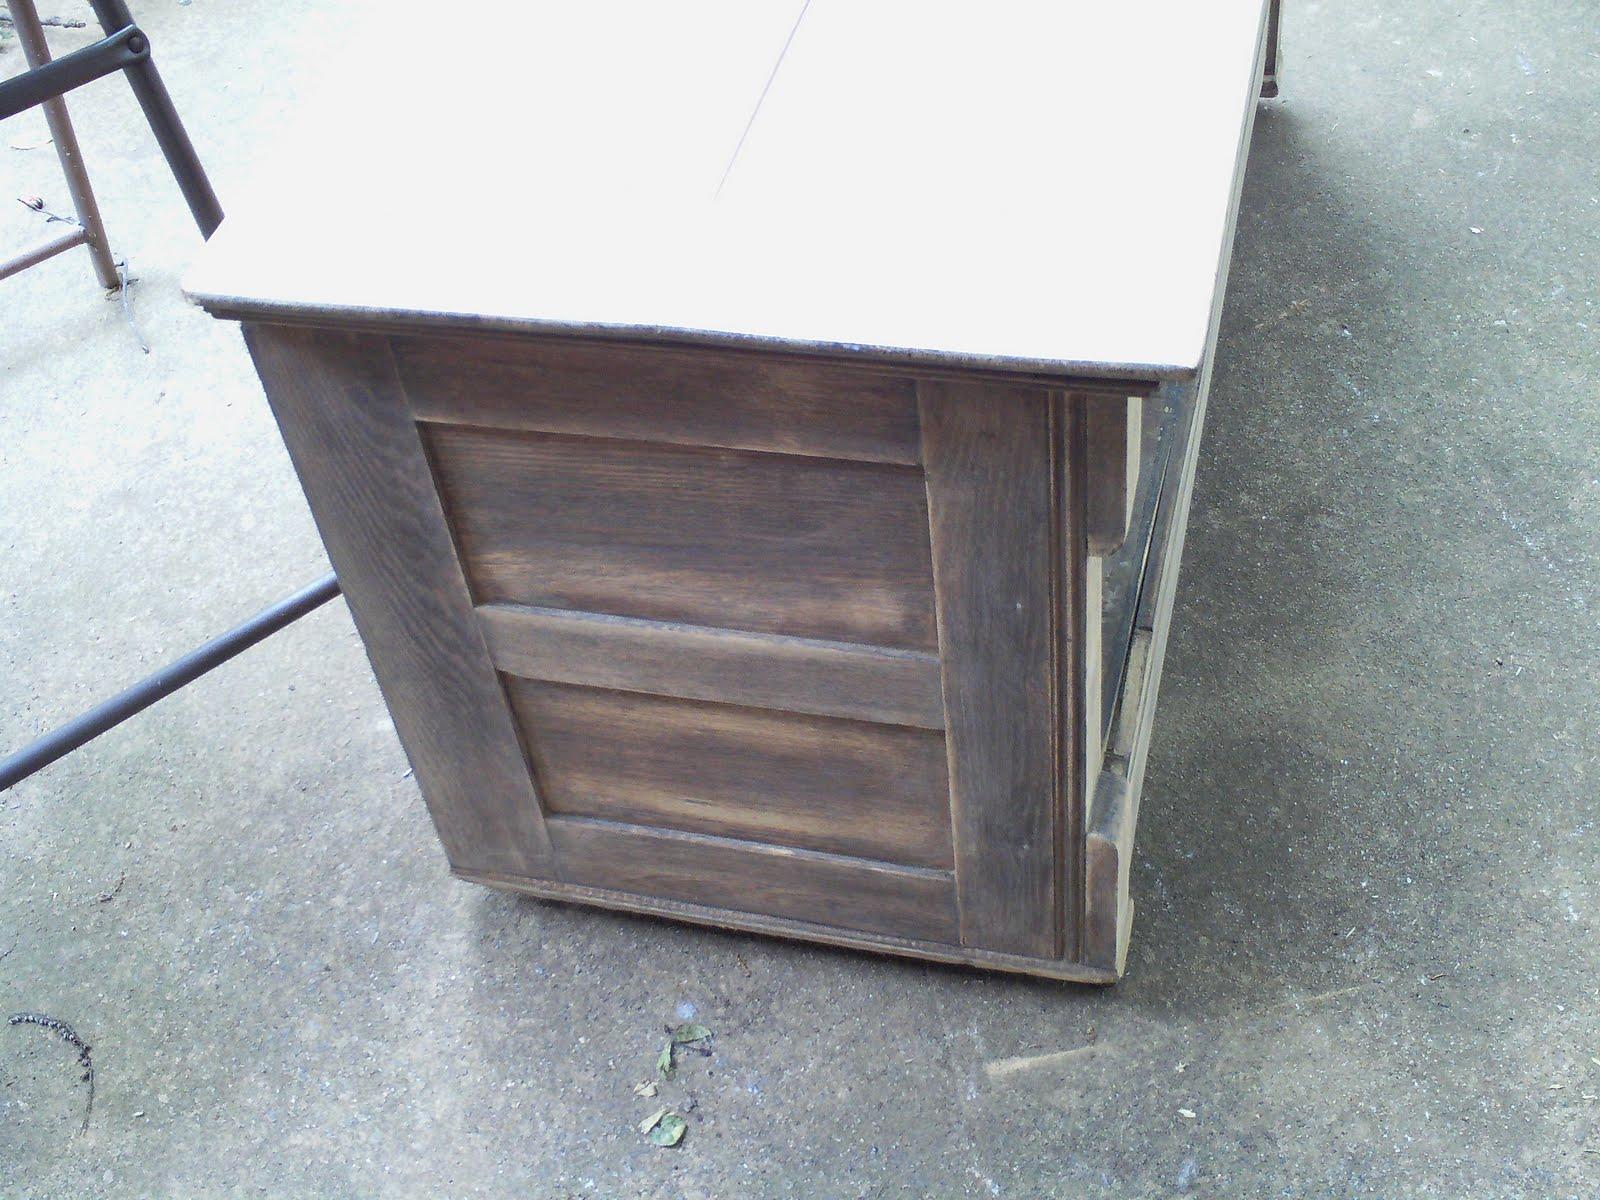 Http Superhandymandave Blogspot Com 2011 05 Redoing Old Furniture Html